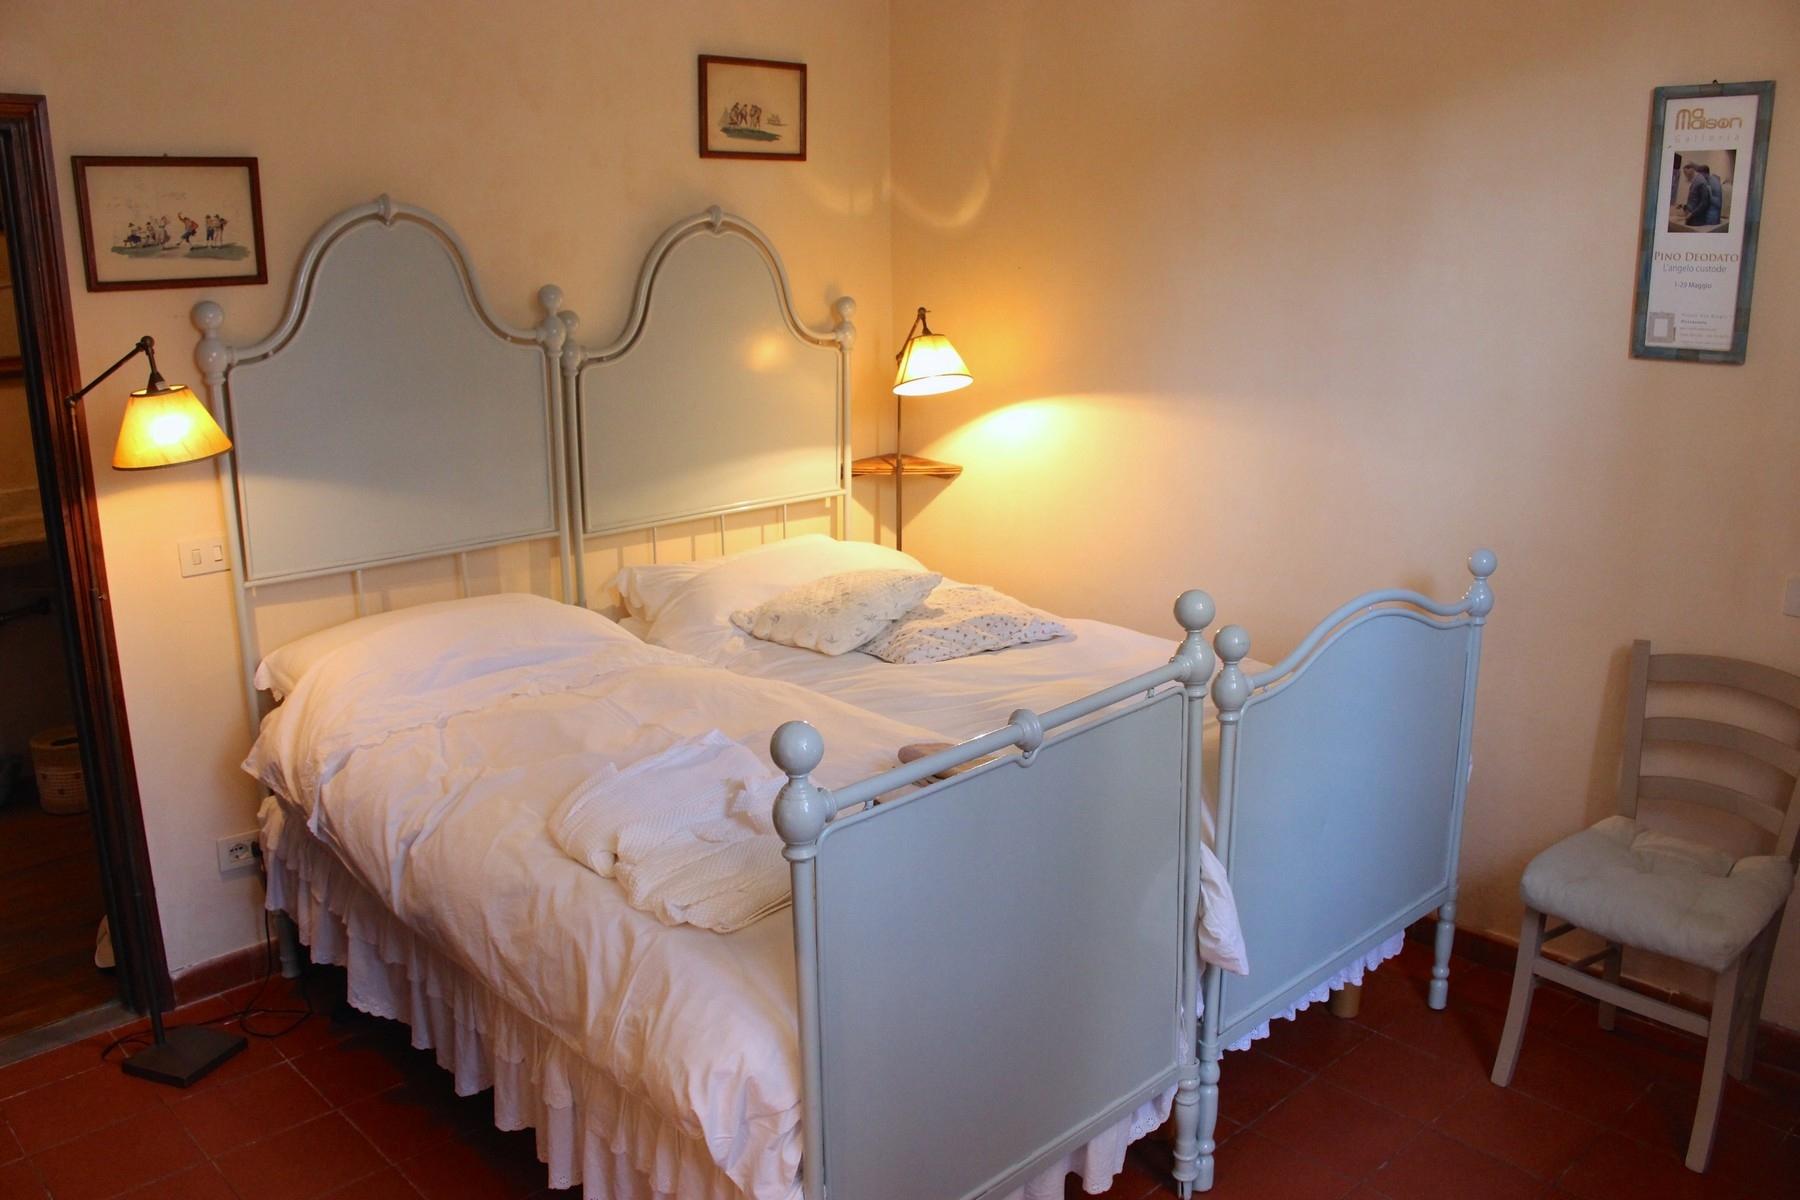 Appartamento in Vendita a San Casciano In Val Di Pesa: 4 locali, 85 mq - Foto 7